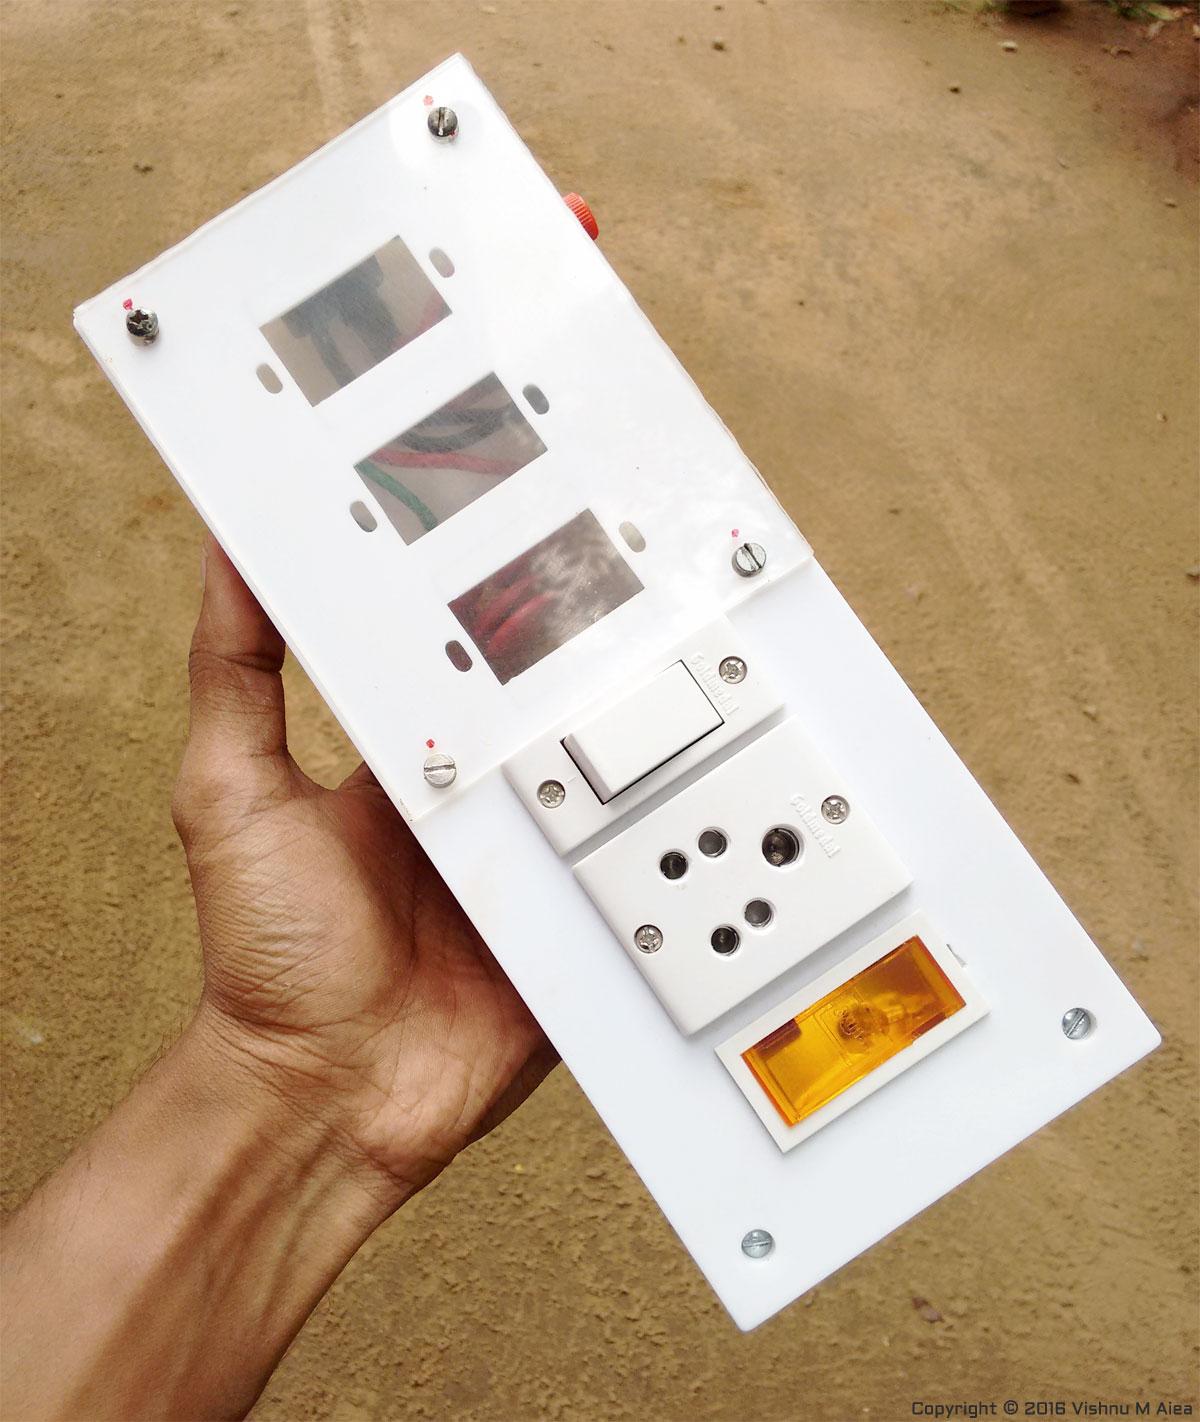 DIY Surge Protector with Line Filter - Vishnu M Aiea